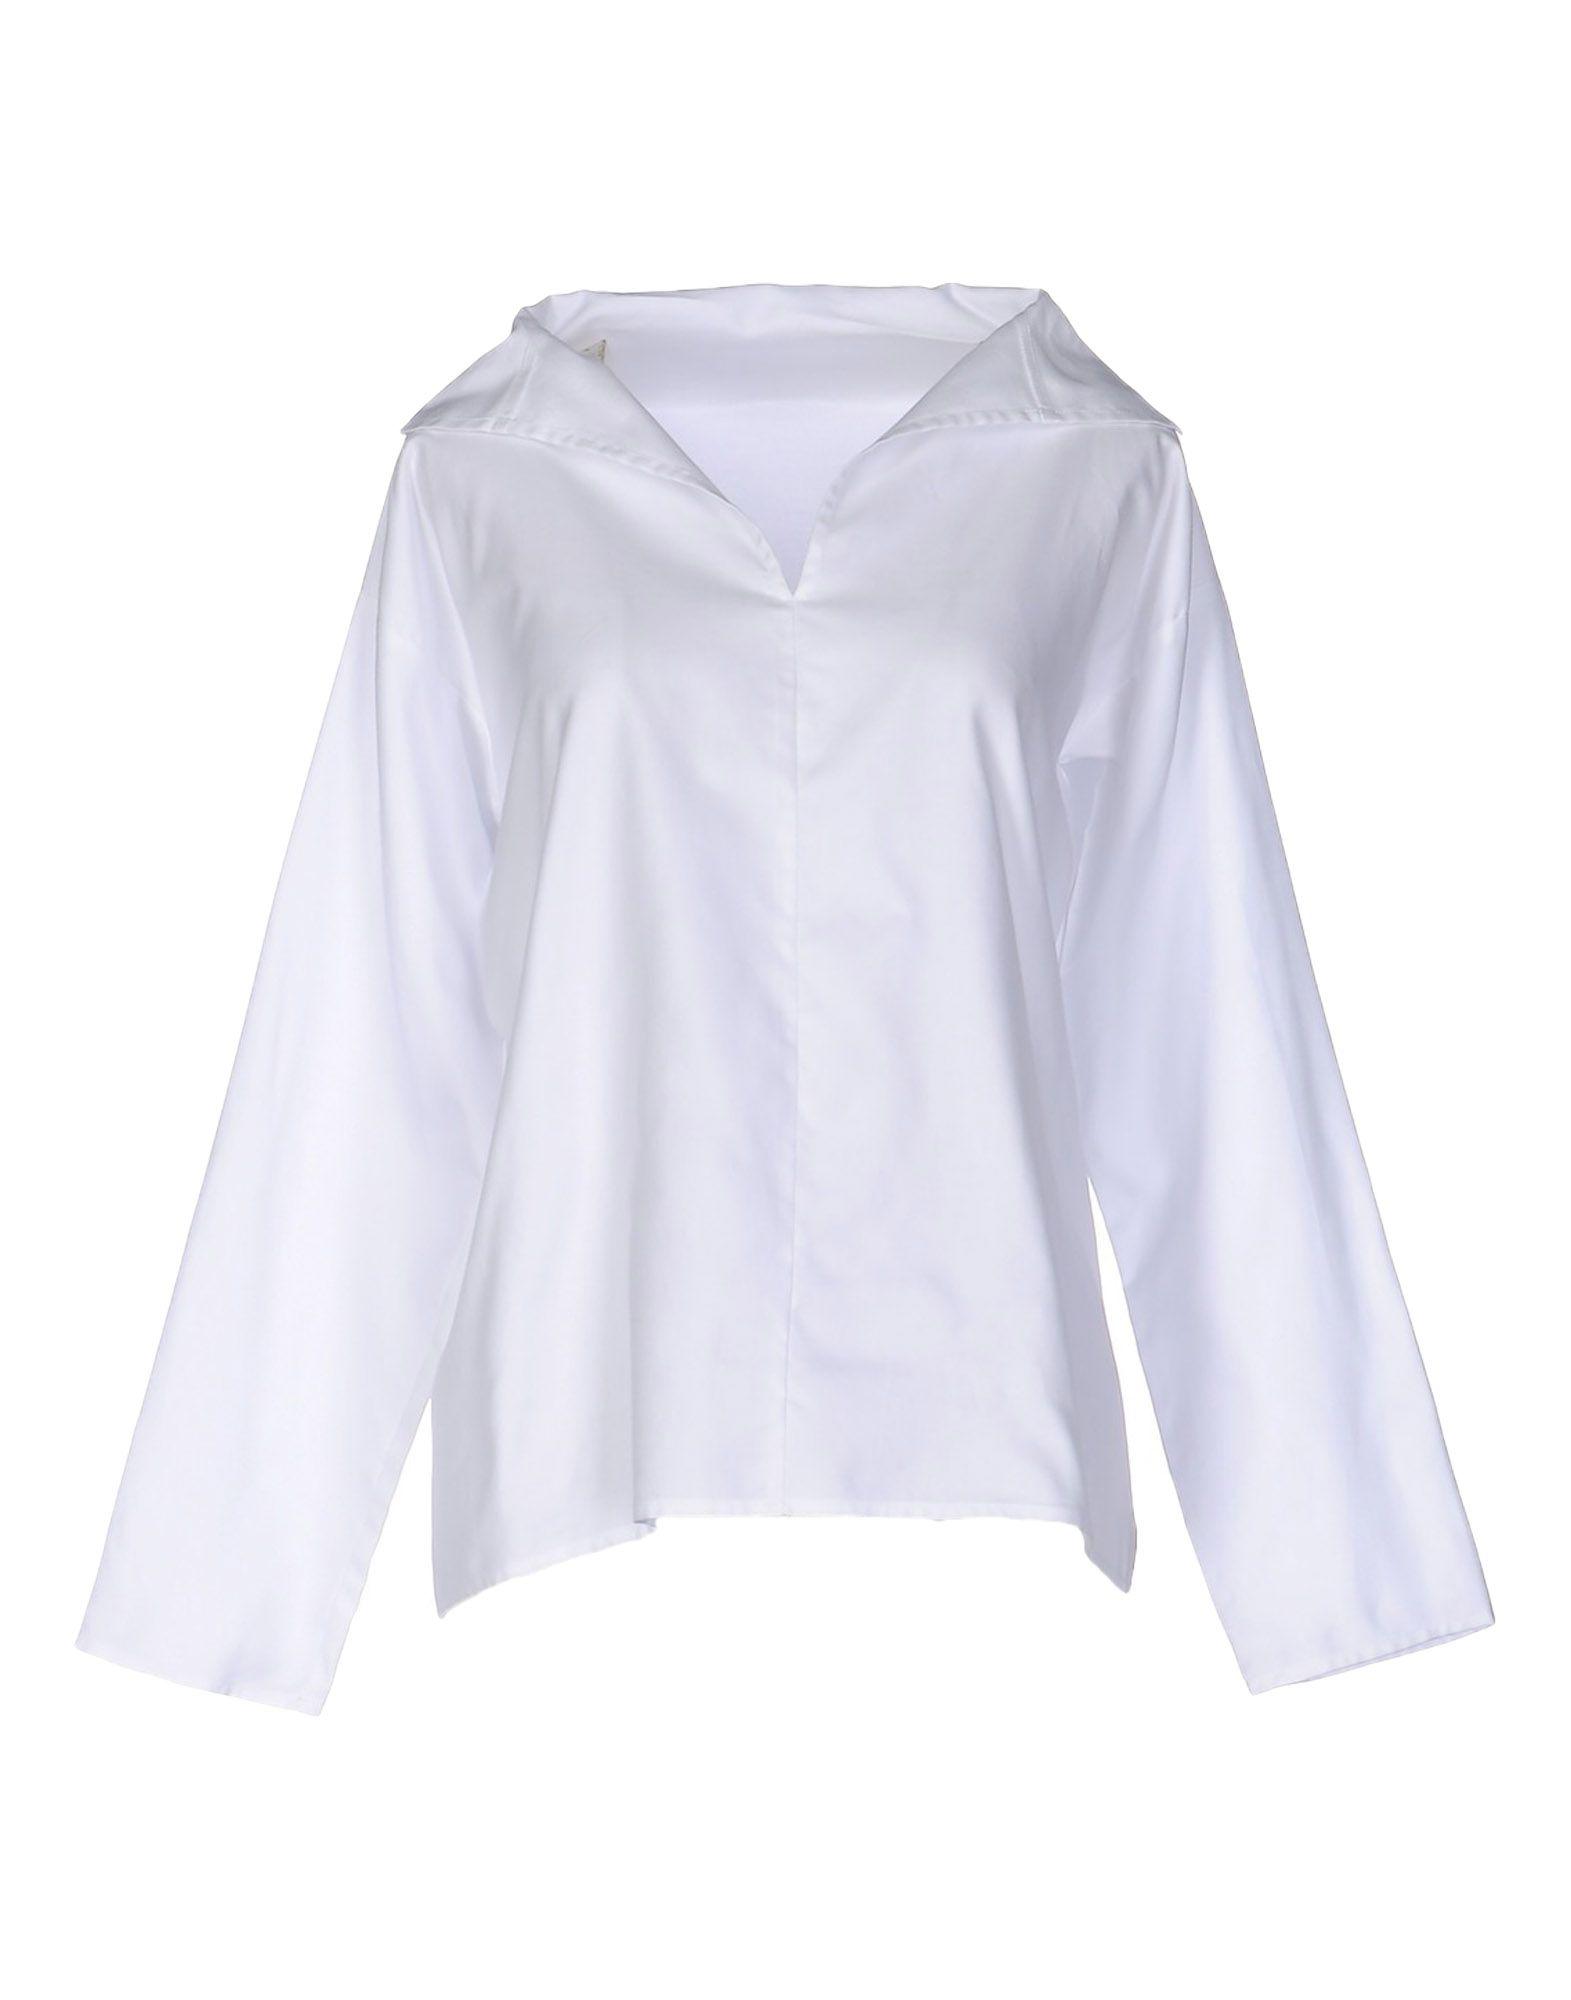 STEPHAN JANSON Блузка цена